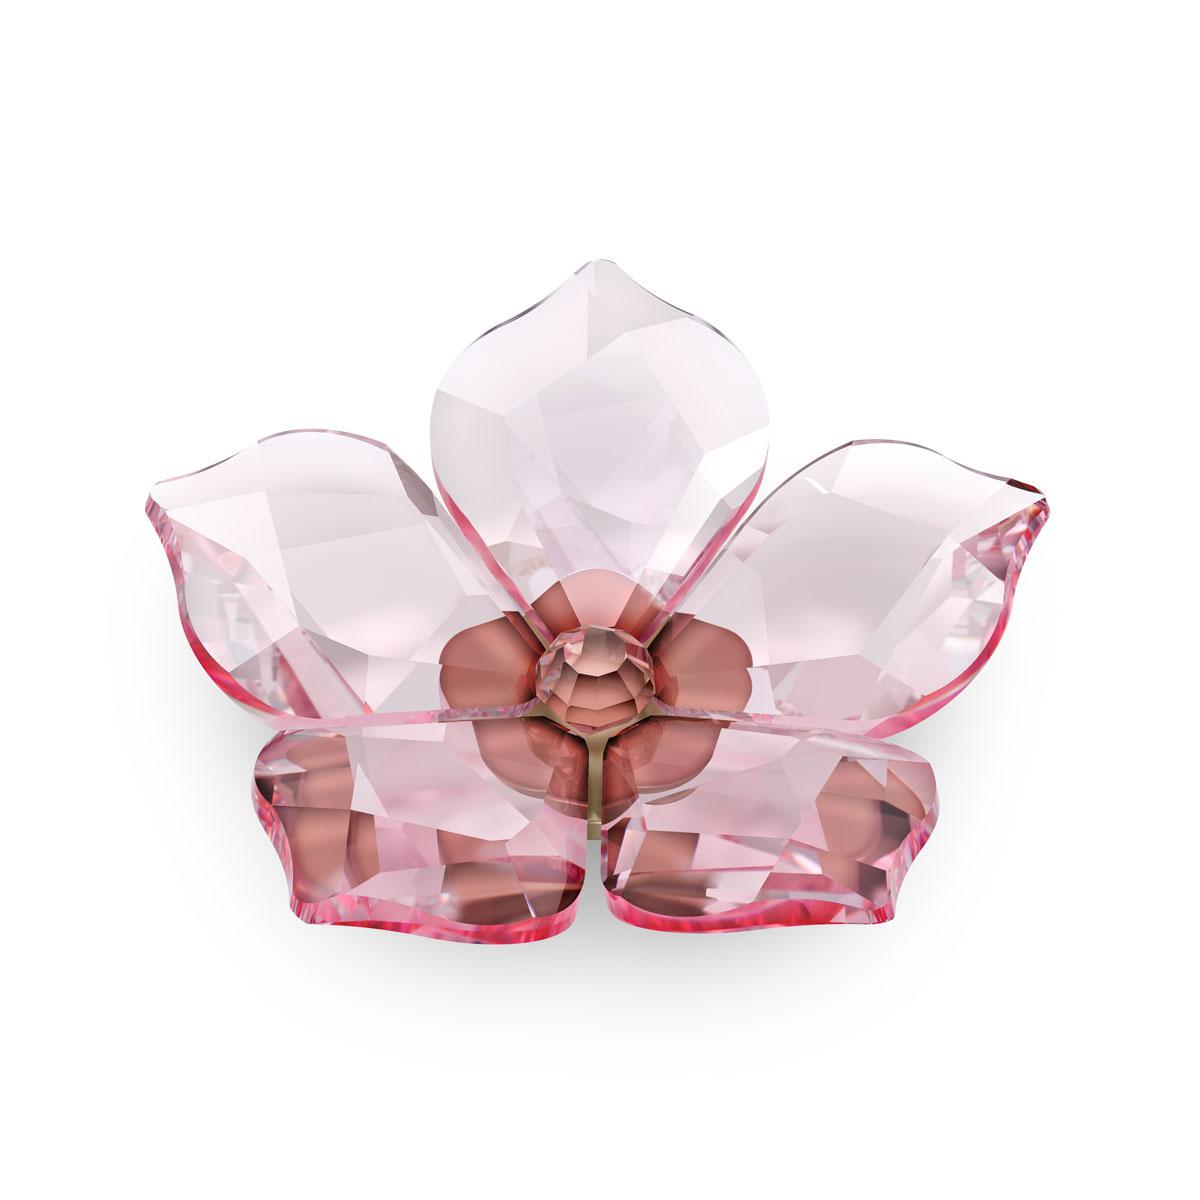 Swarovski Flowers Garden Tales Magnet Cherry Blossom Large